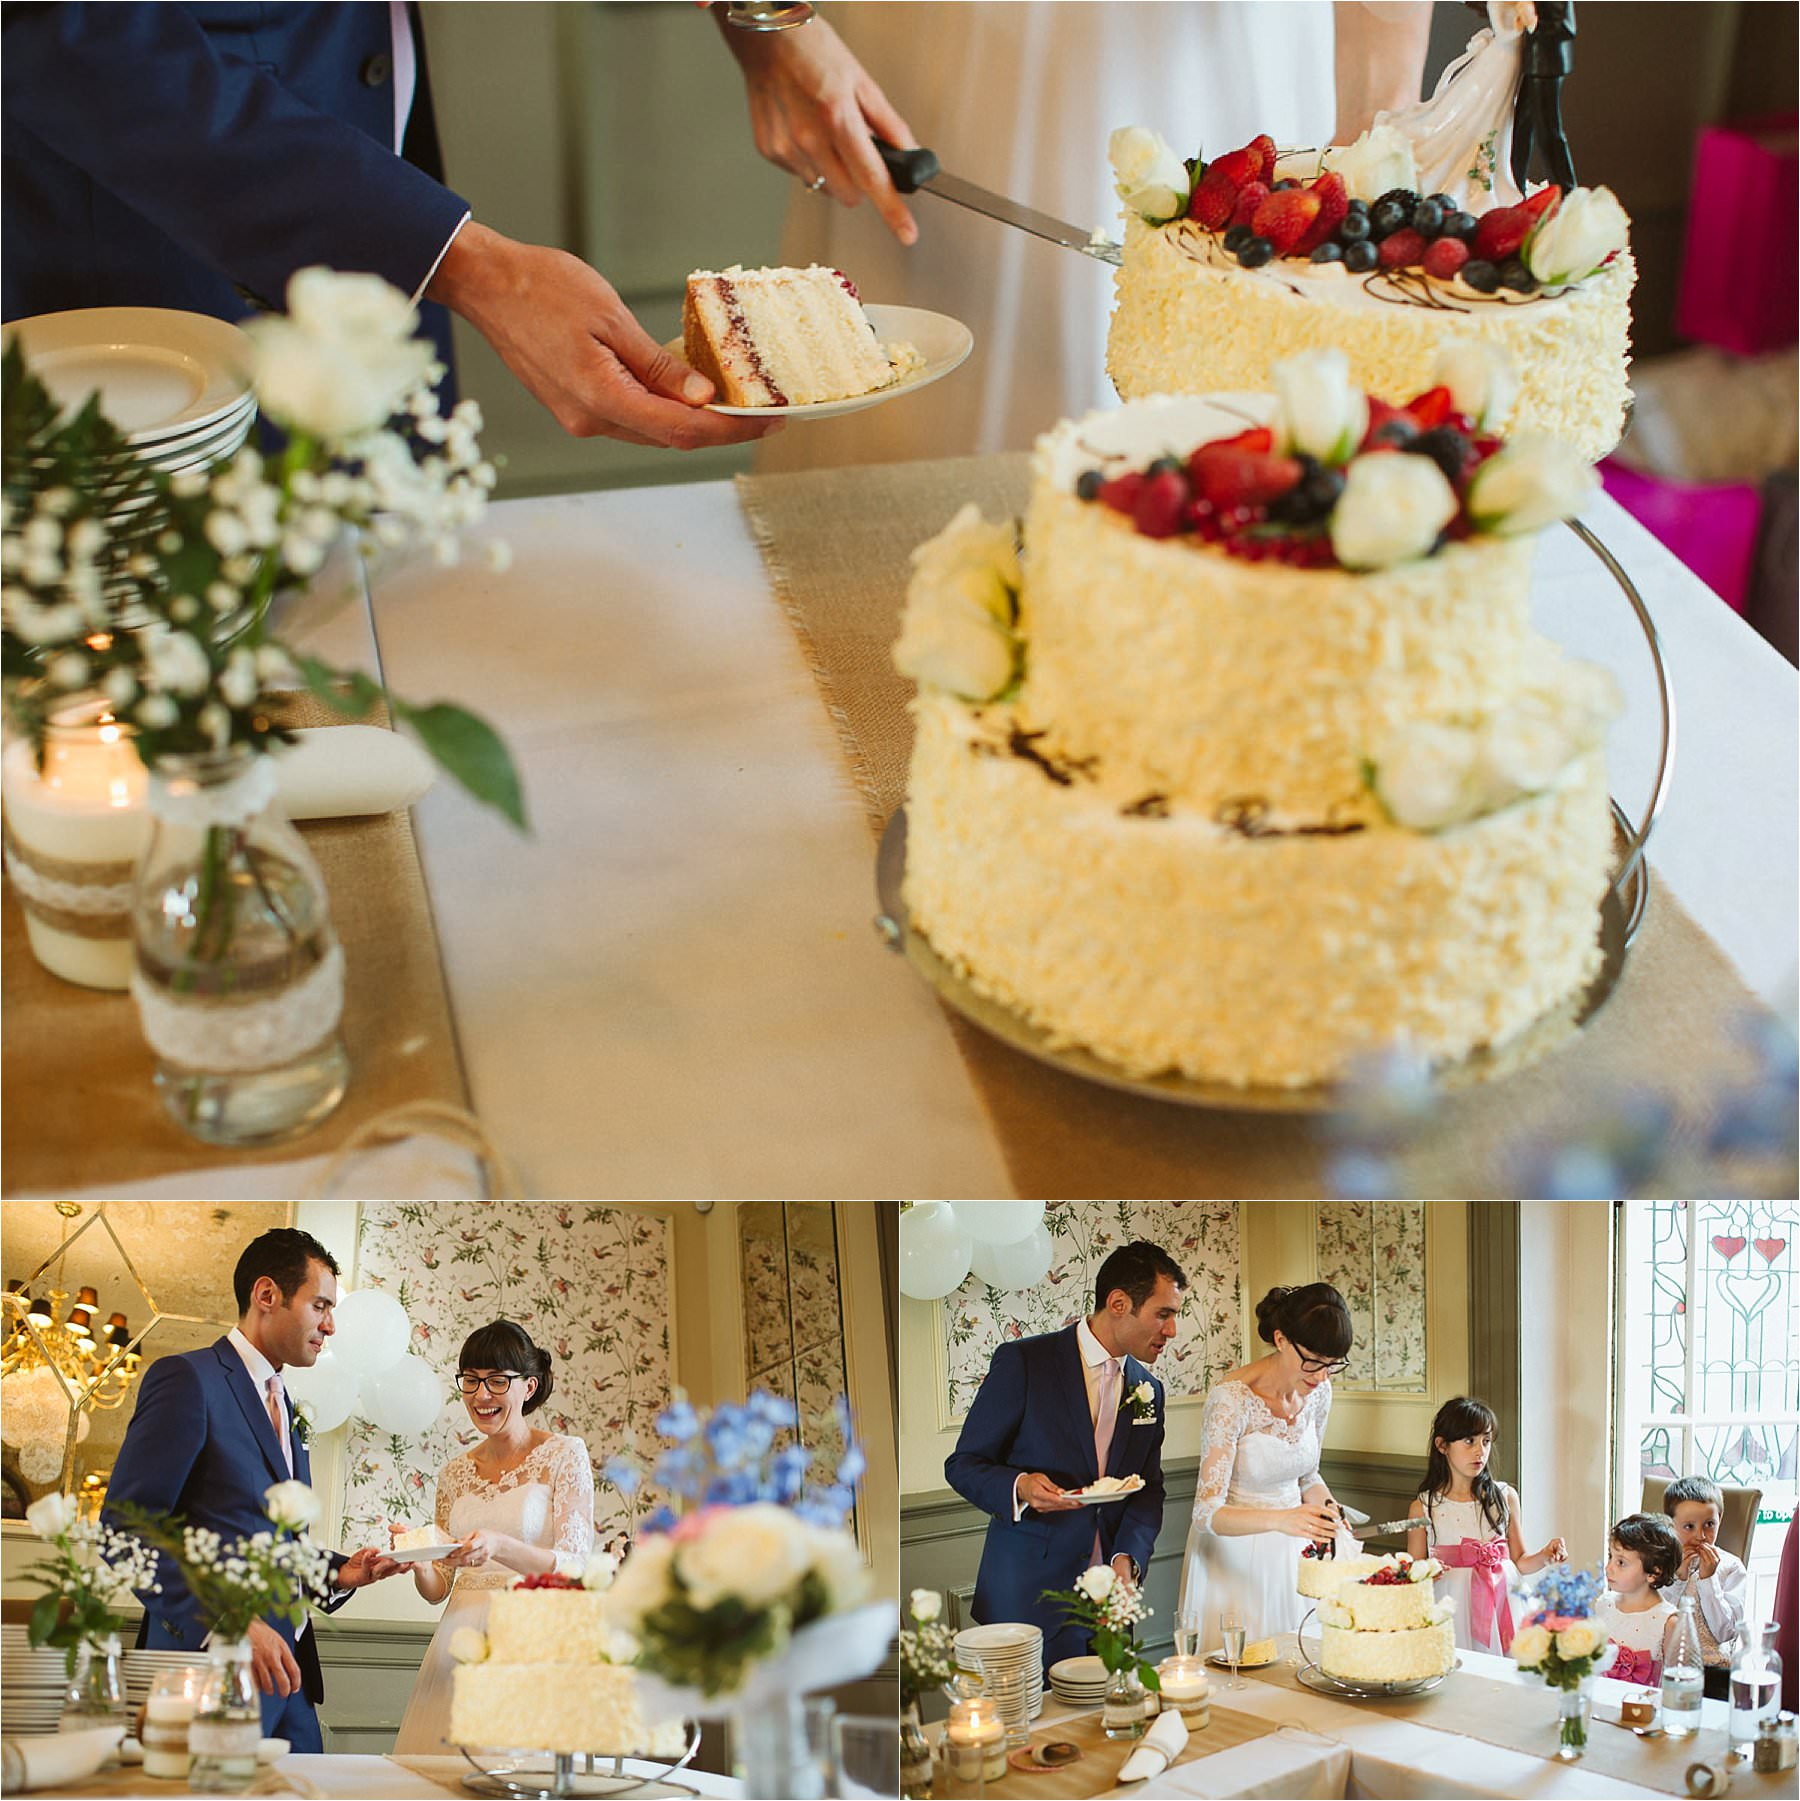 Cake cutting at DIY Wedding Little Venice London